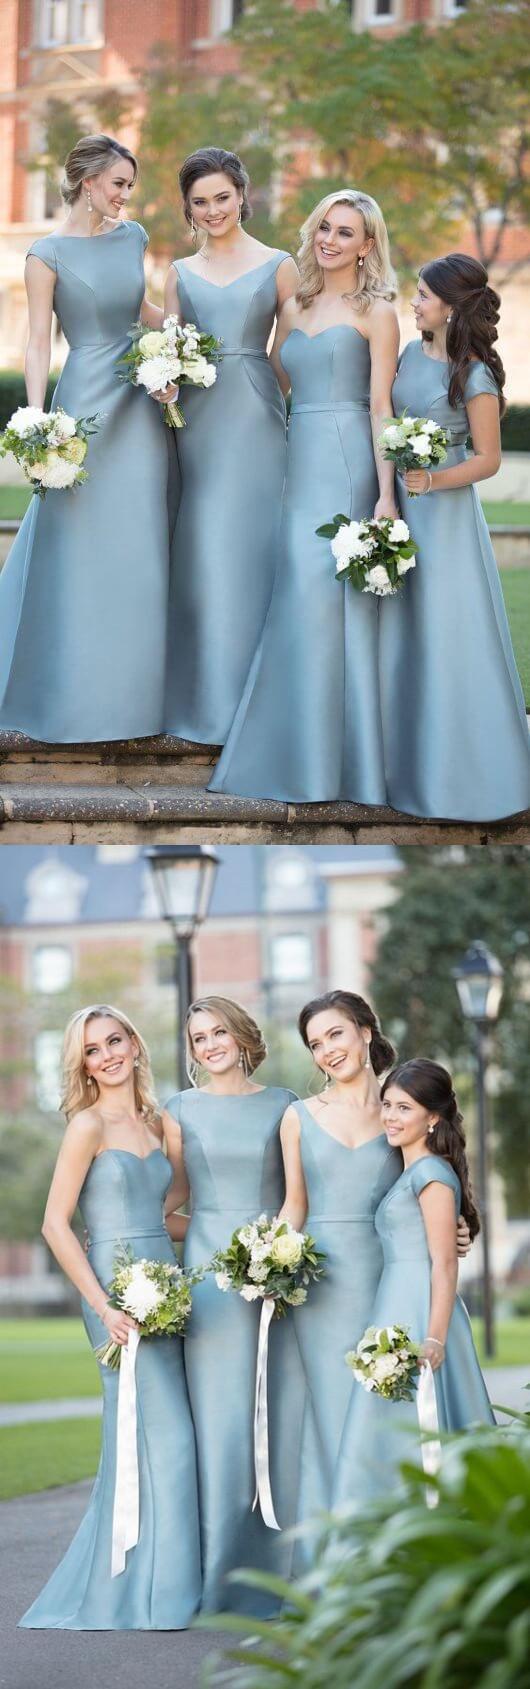 Round Neck/Sweetheart or V neck Blue Satin Long Bridesmaid Dress